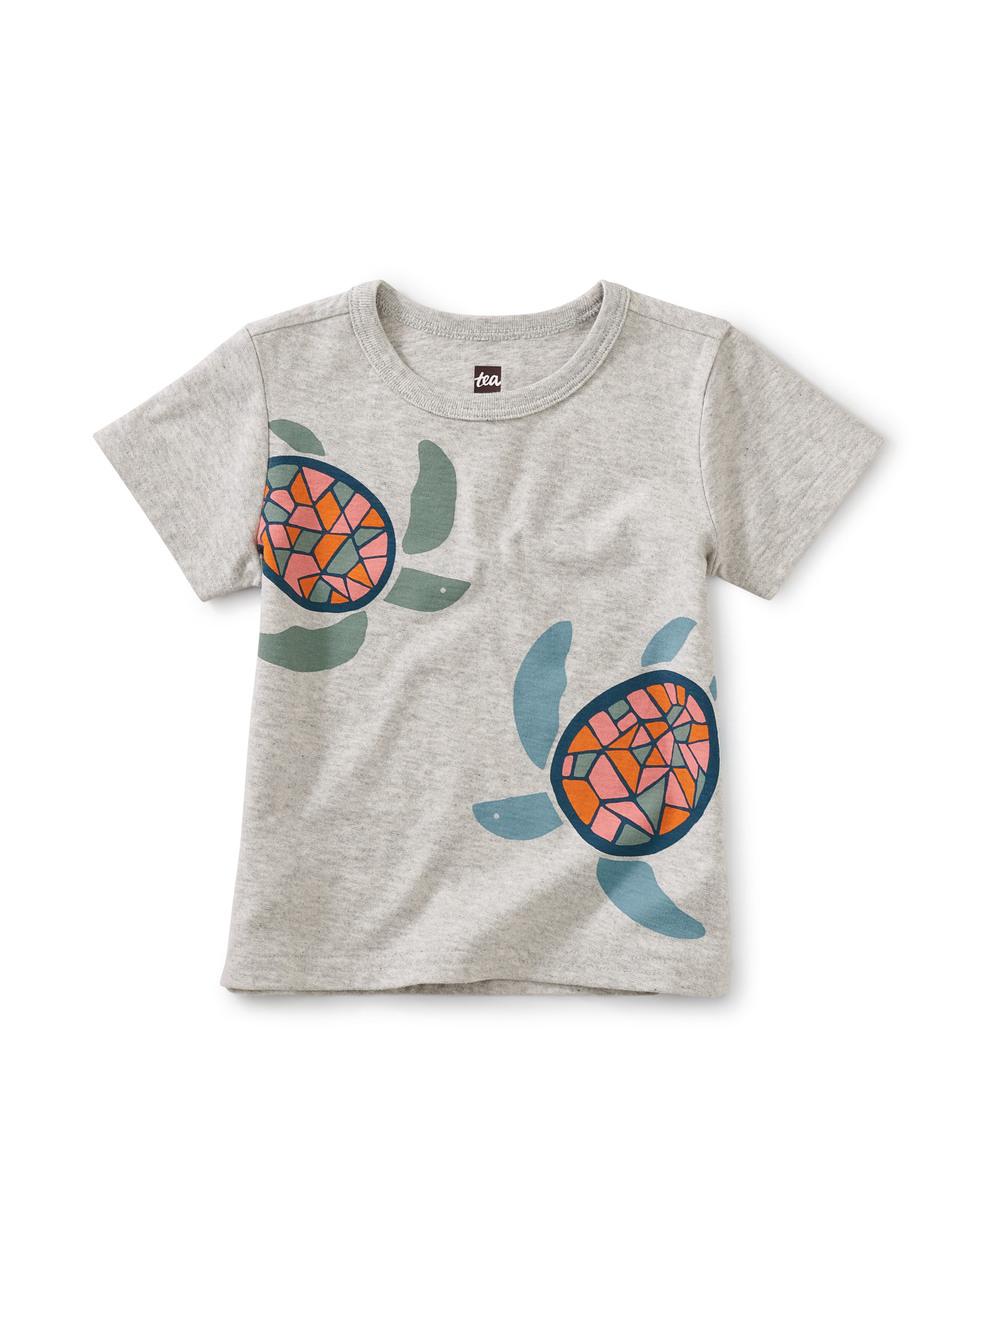 Sea Turtles Baby Graphic Tee